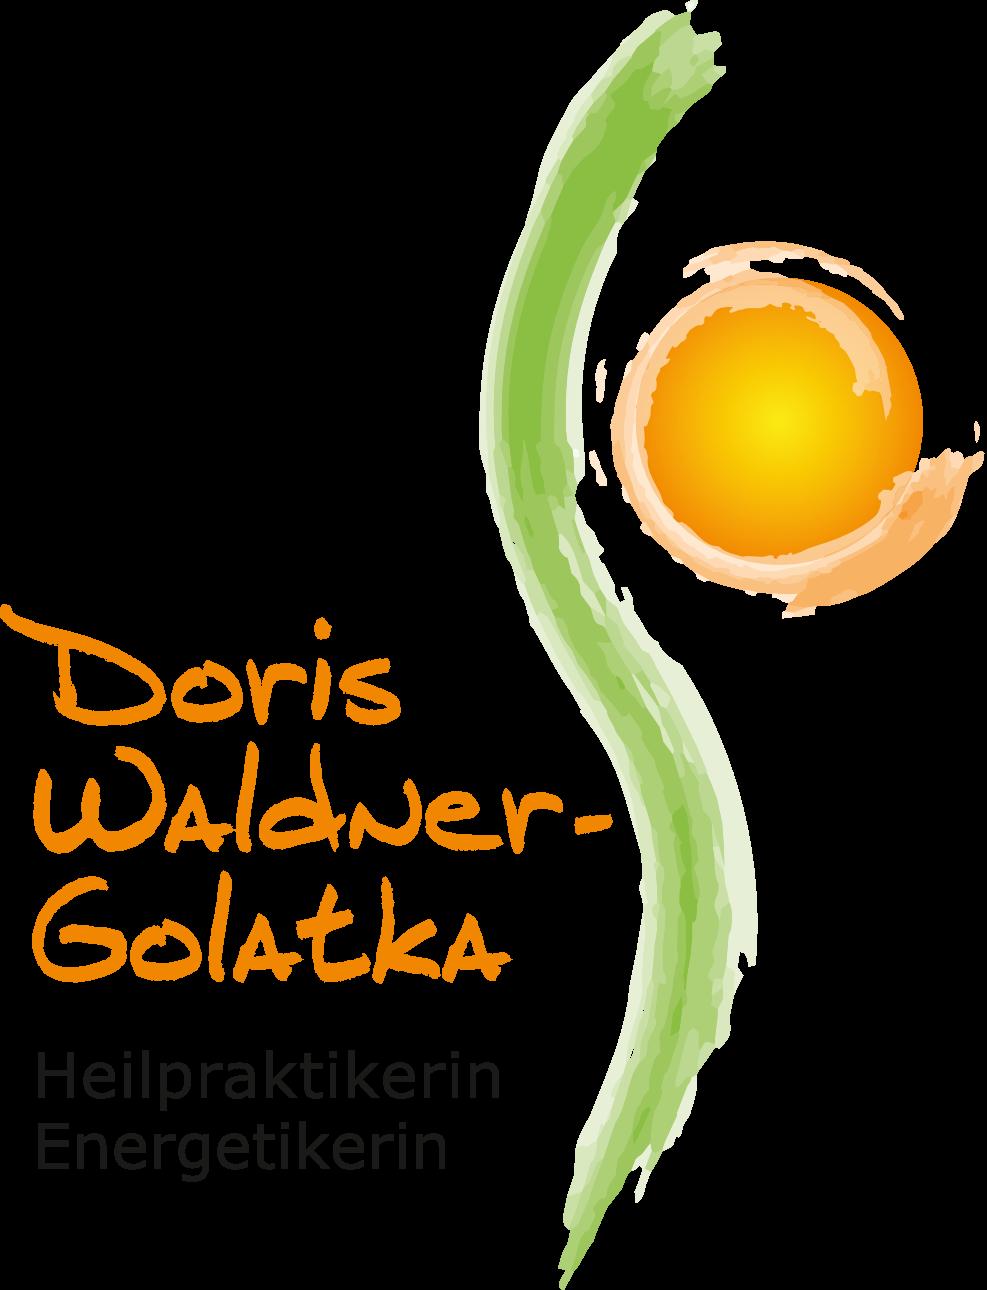 Doris Waldner-Golatka